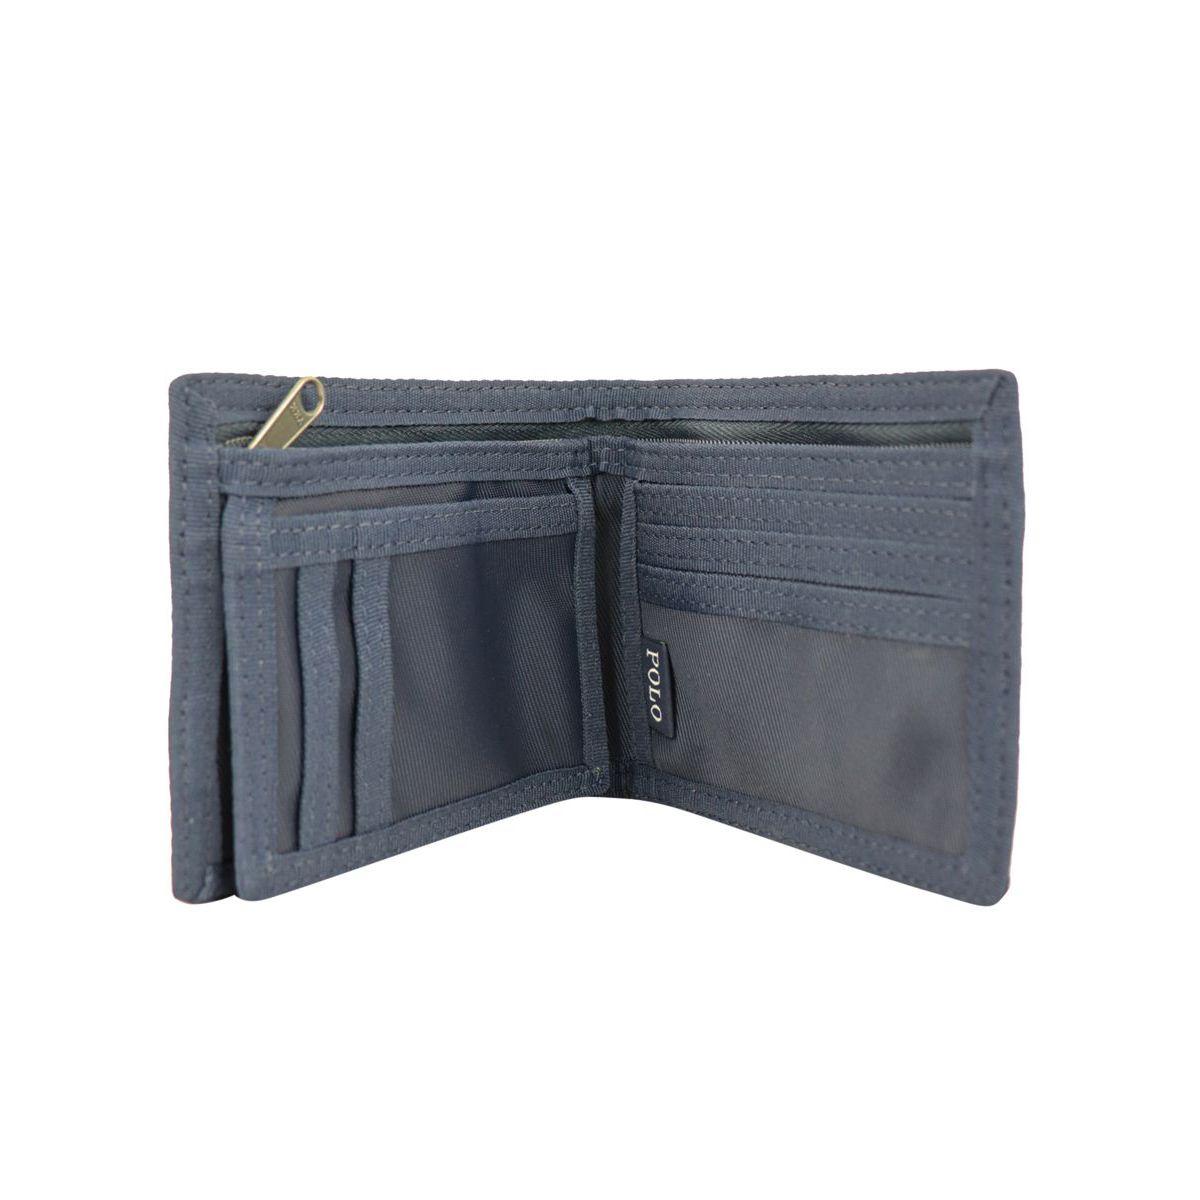 Nylon wallet with logo print Navy Polo Ralph Lauren